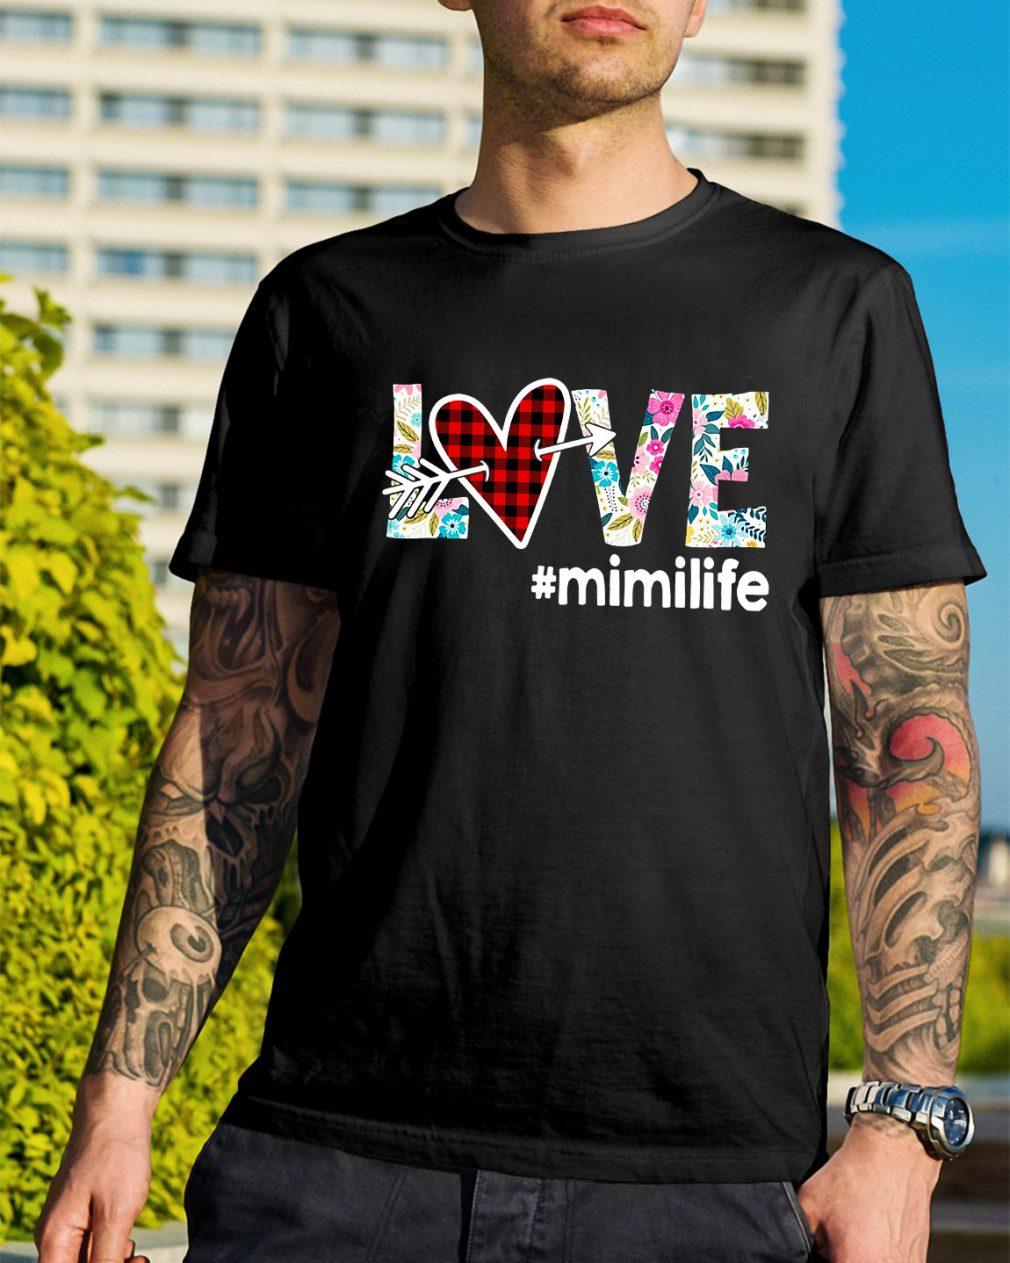 Love #mimilife shirt